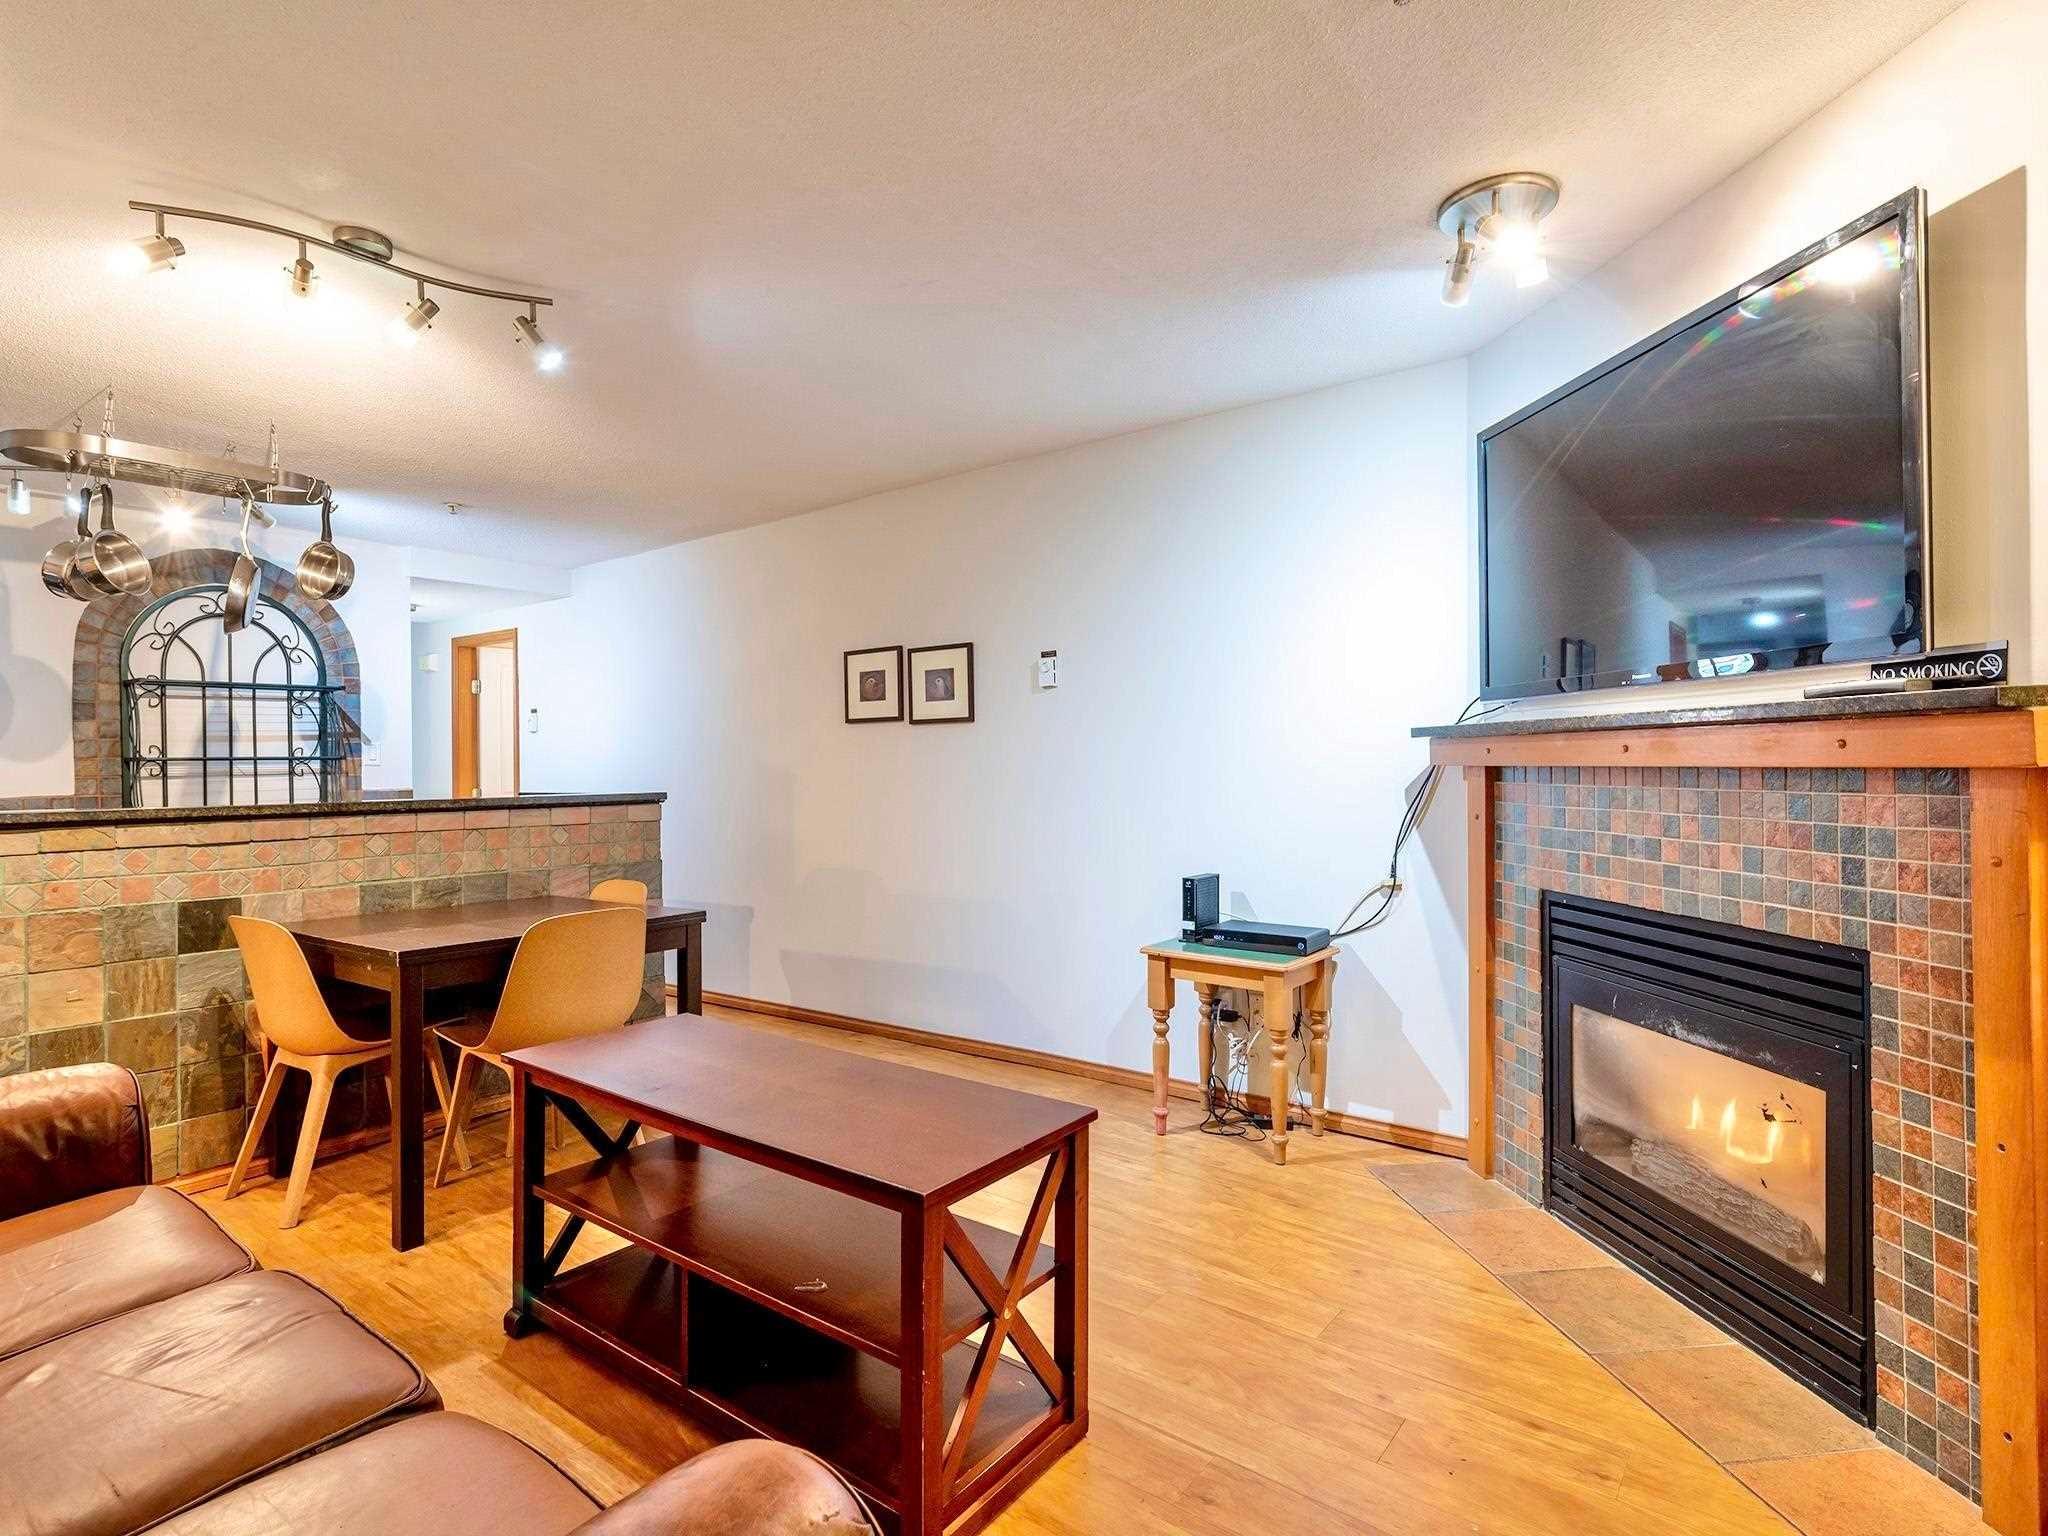 73 4388 NORTHLANDS BOULEVARD - Whistler Village Townhouse for sale, 2 Bedrooms (R2580863) - #5